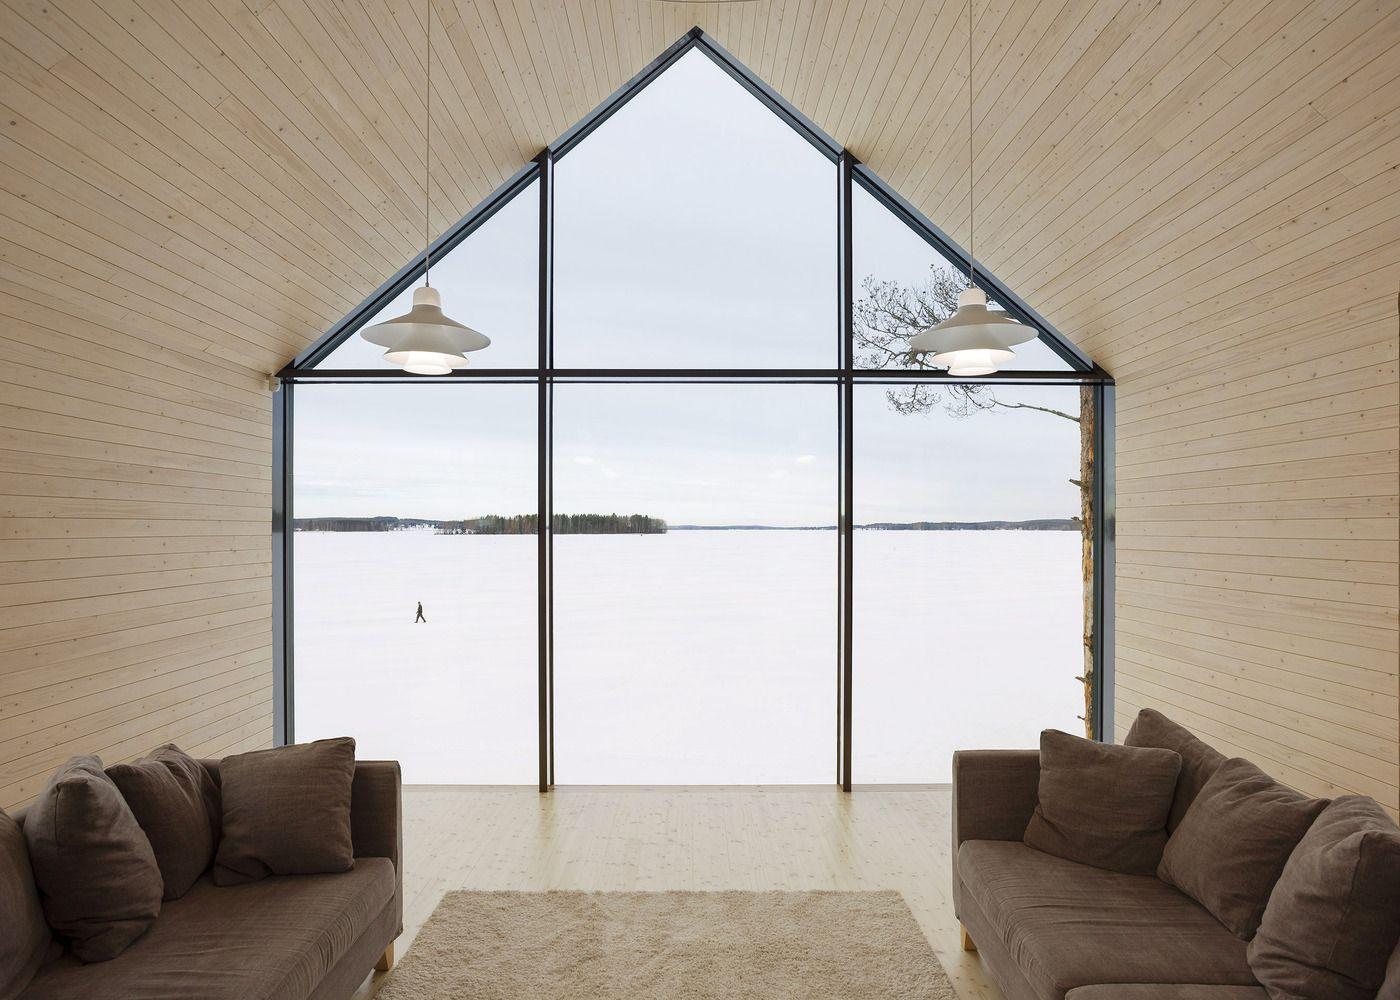 Window design for small house  gallery of house y  arkkitehtitoimisto teemu pirinen    house